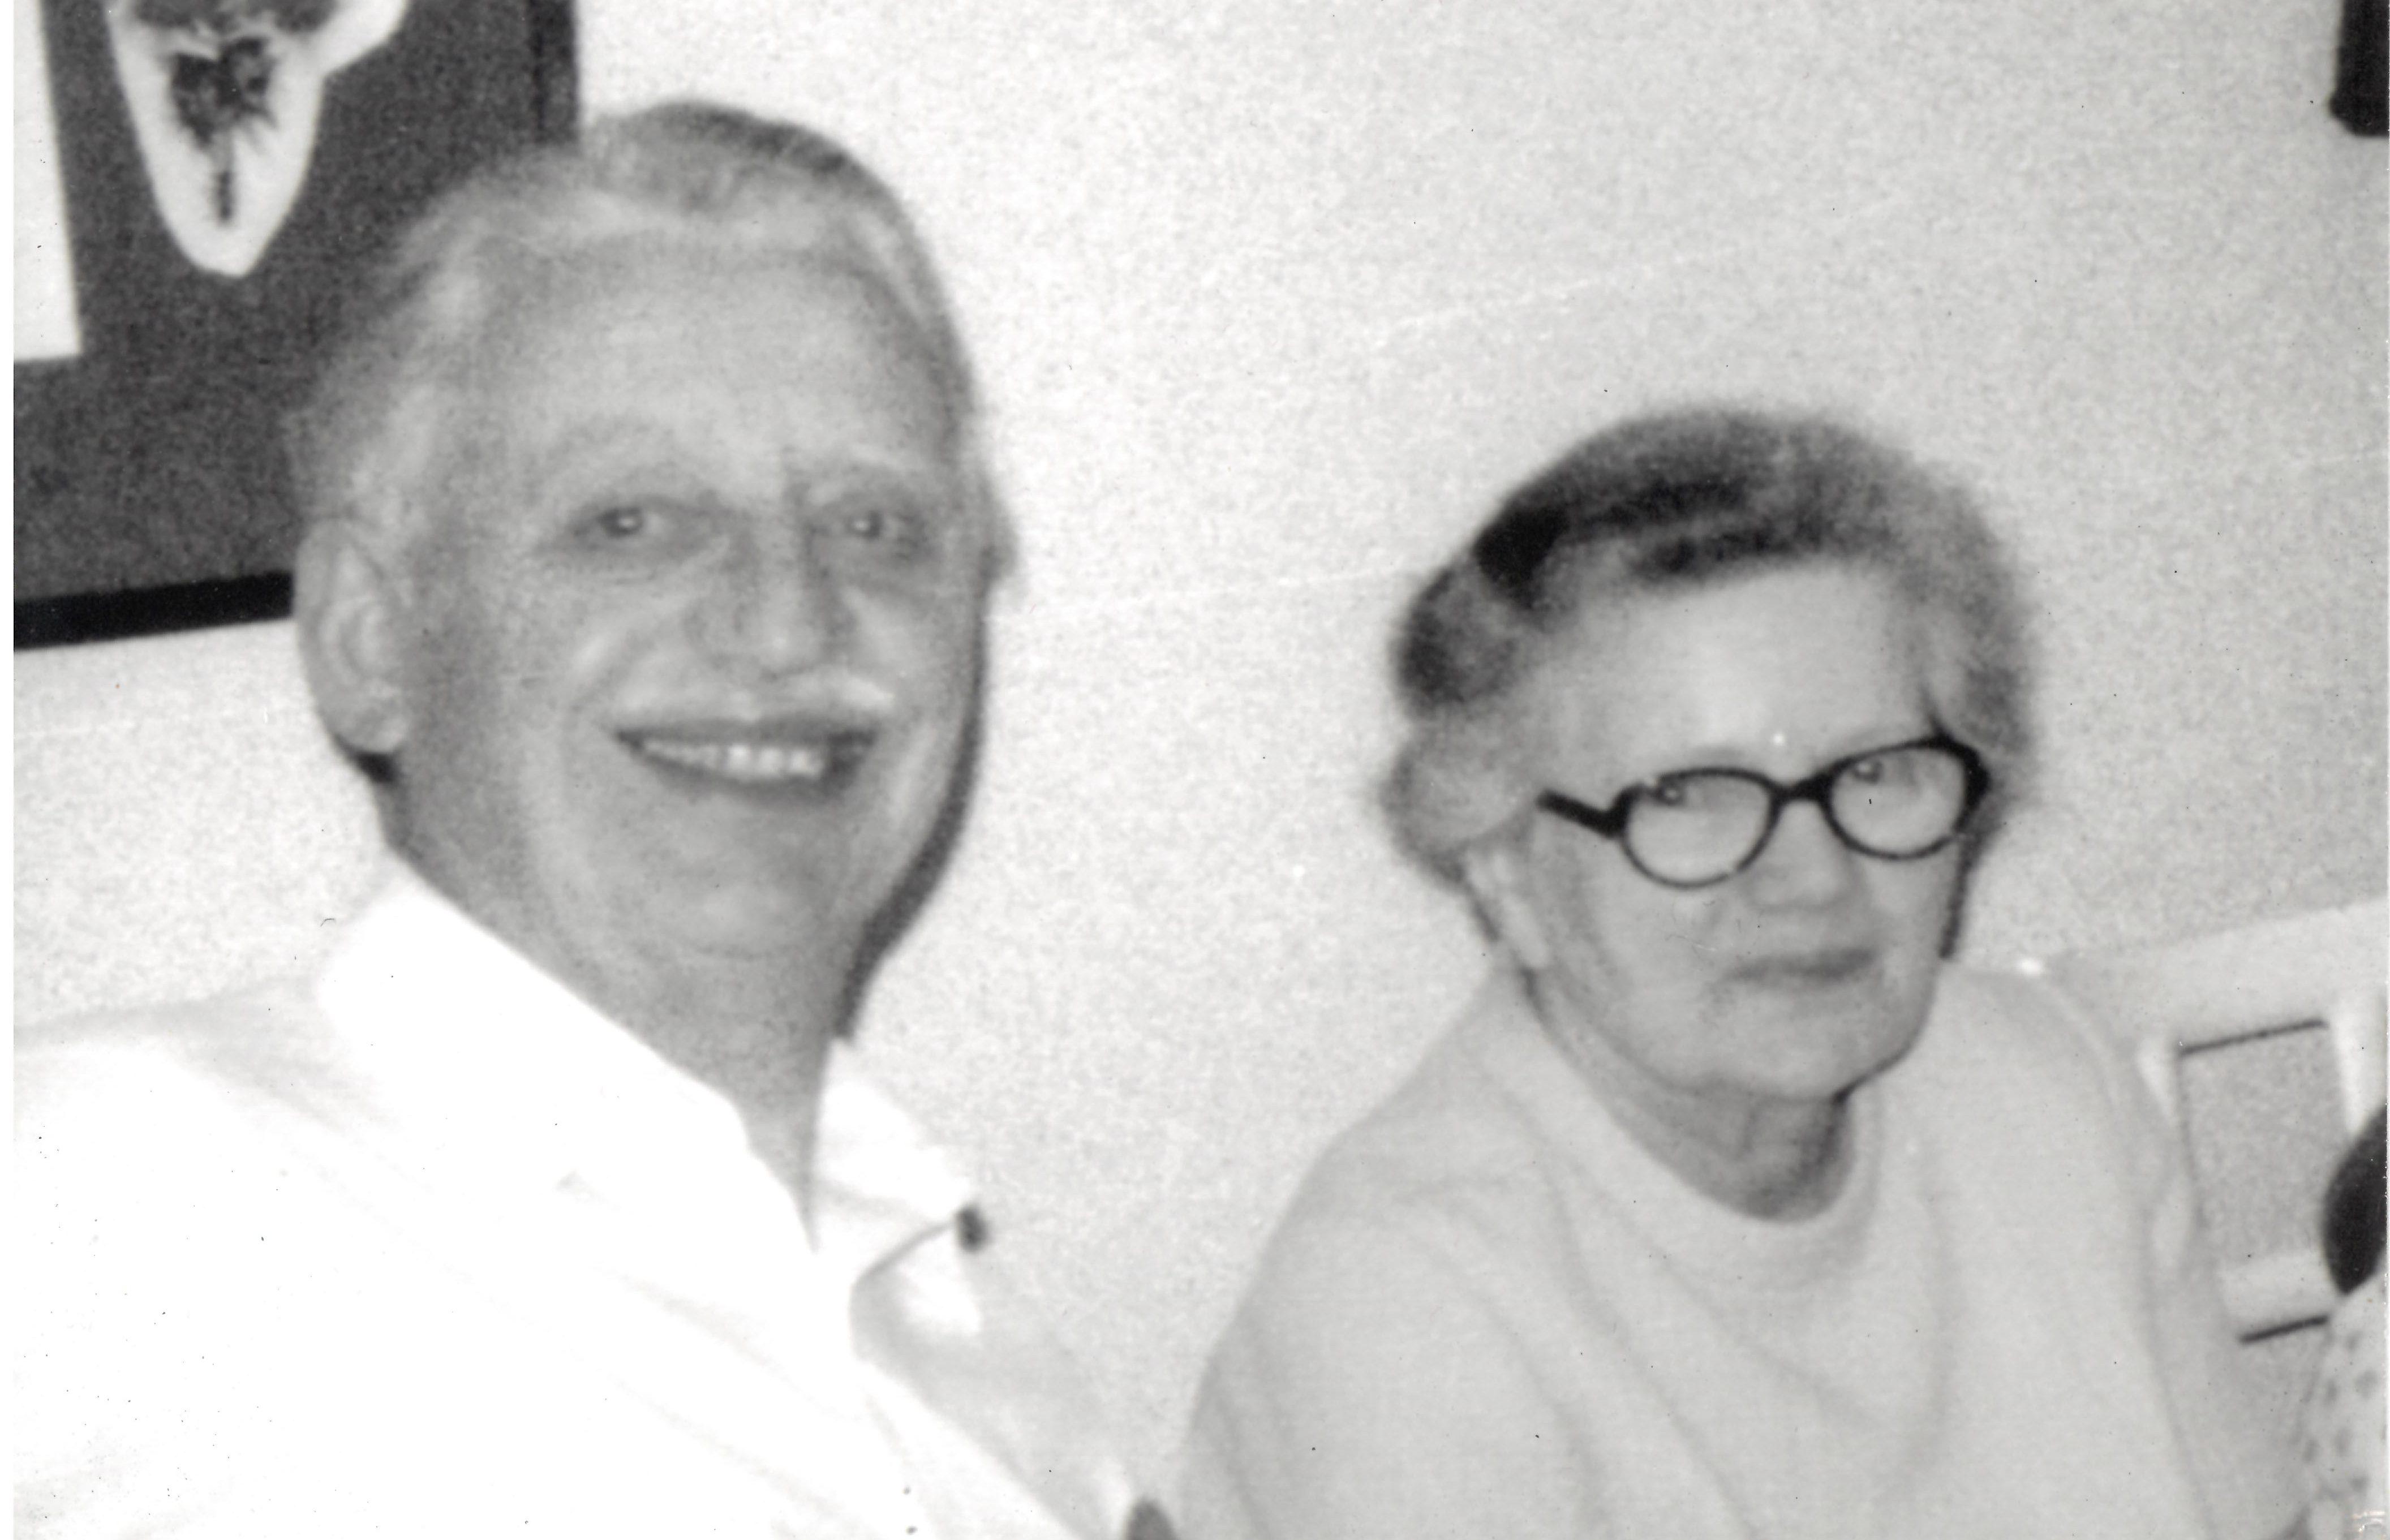 Photo of Herman and Virginia Gundlach